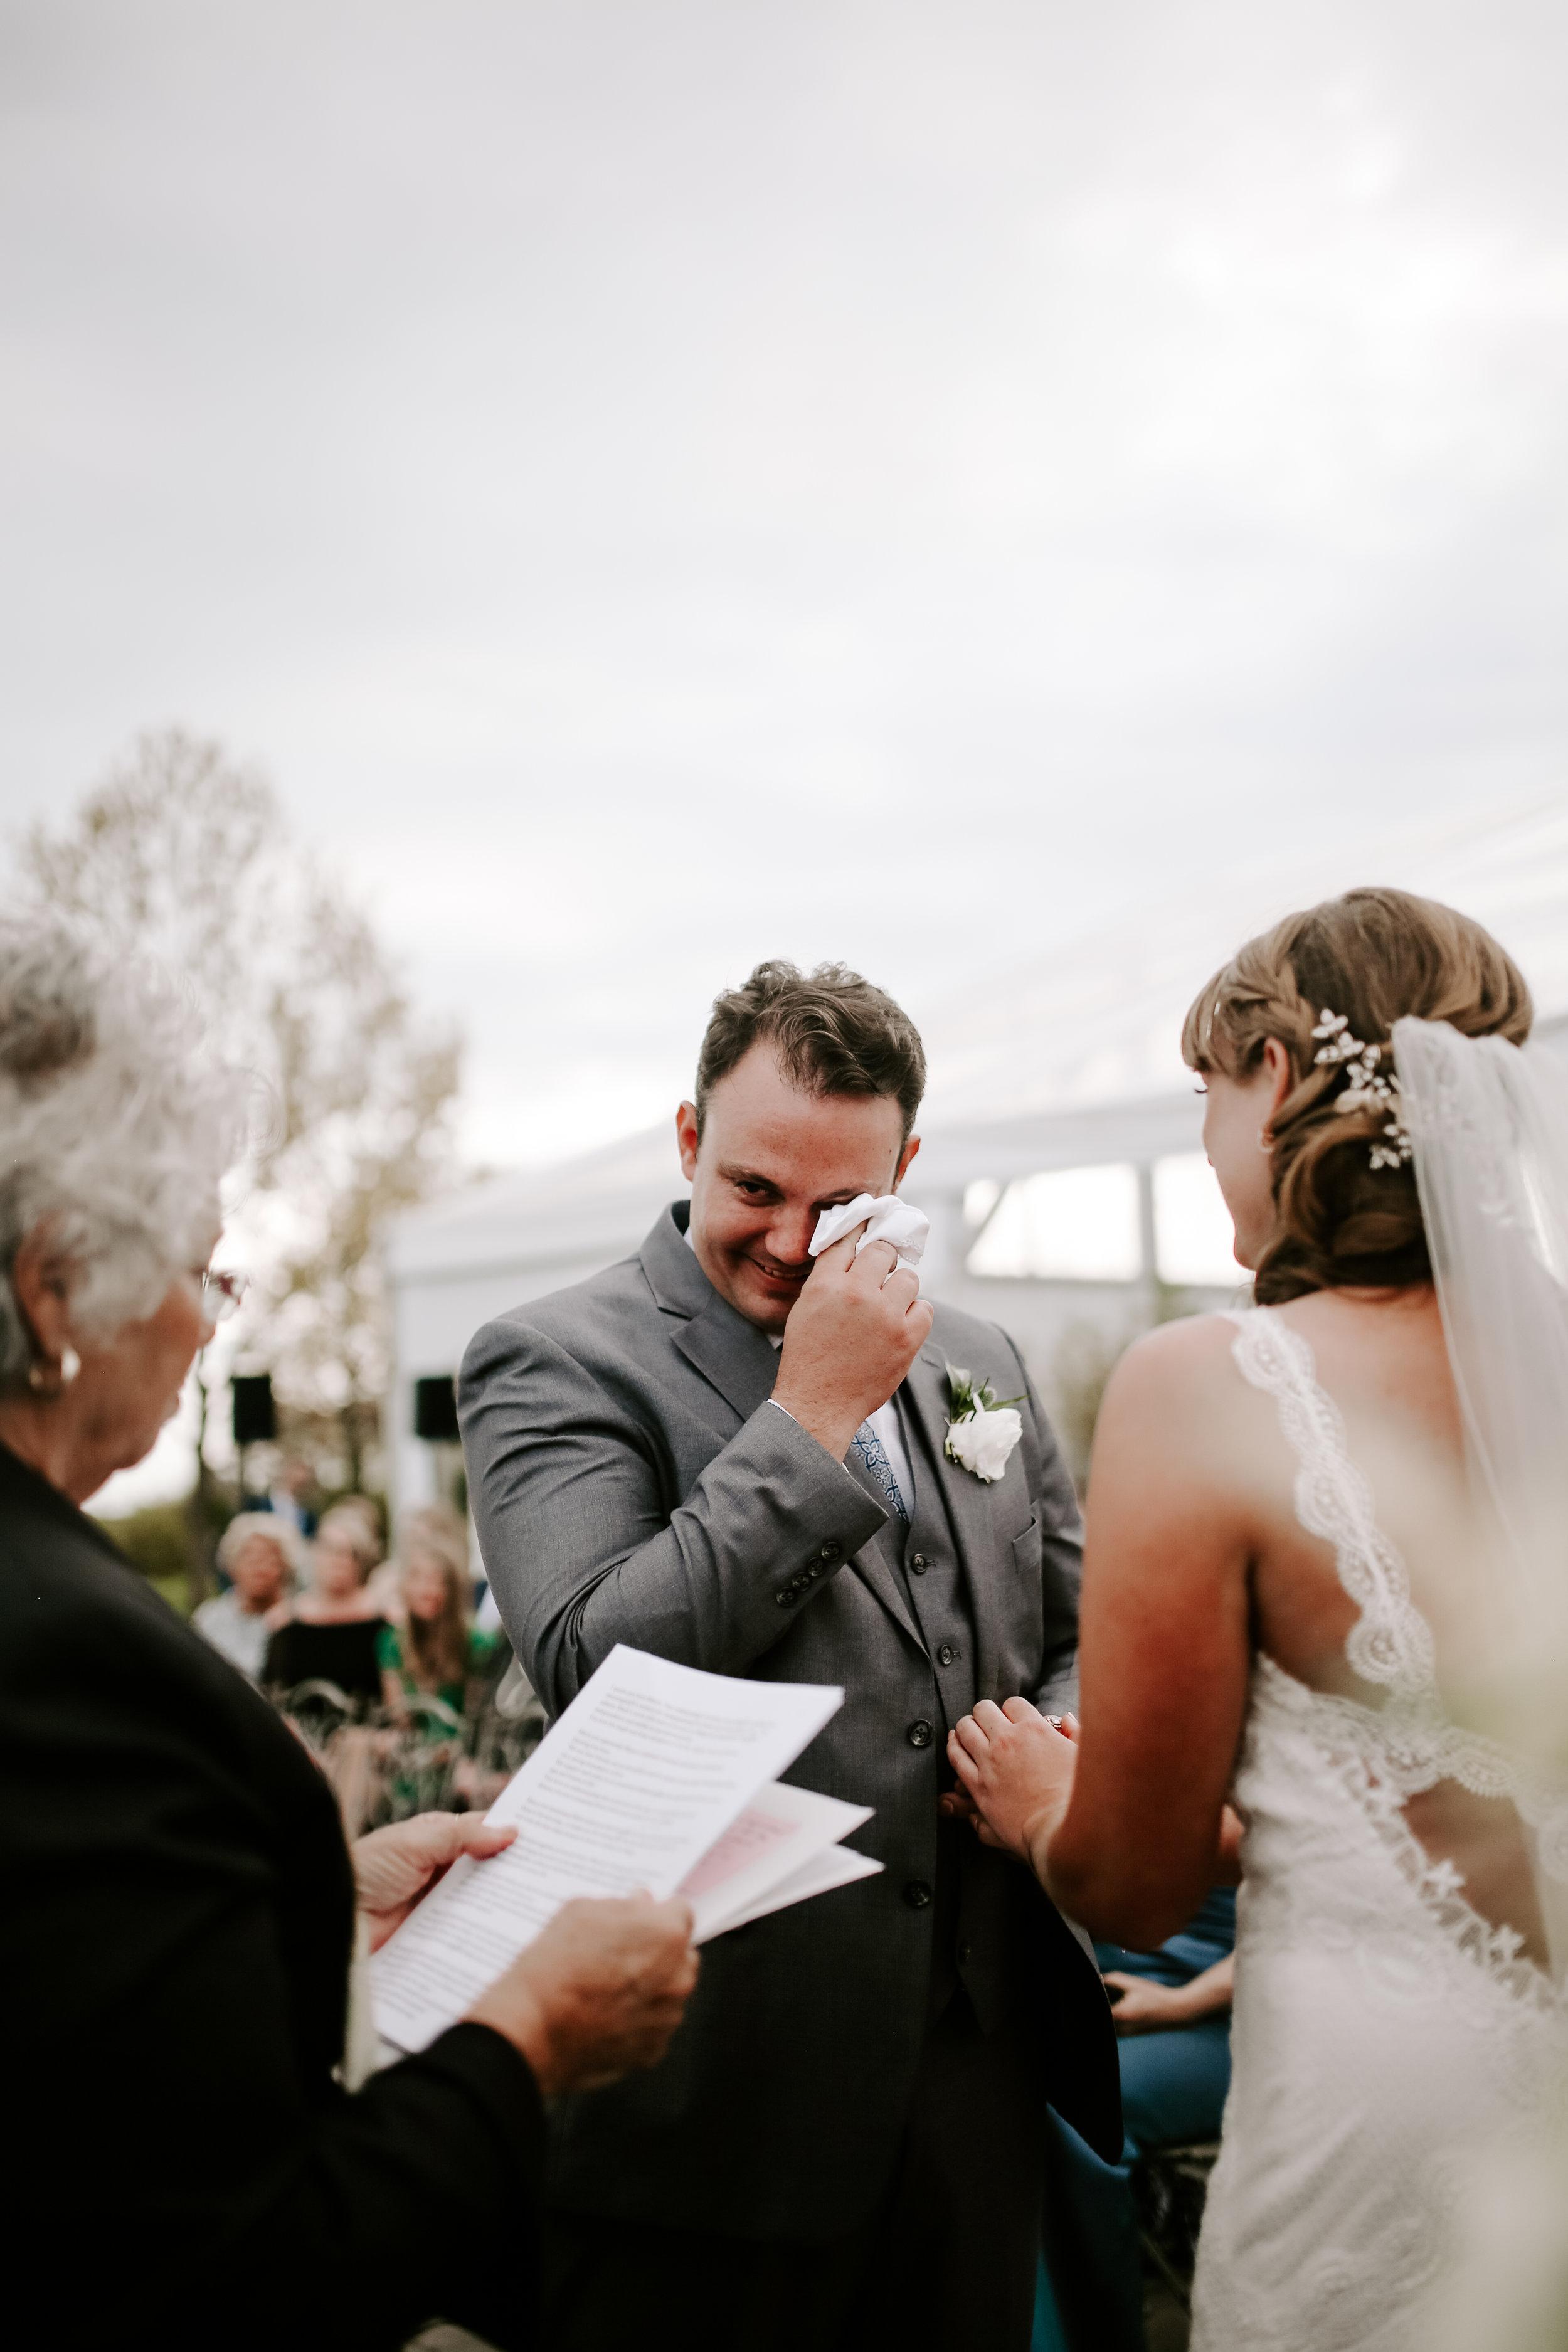 TheGreens_Married_2019-309.jpg